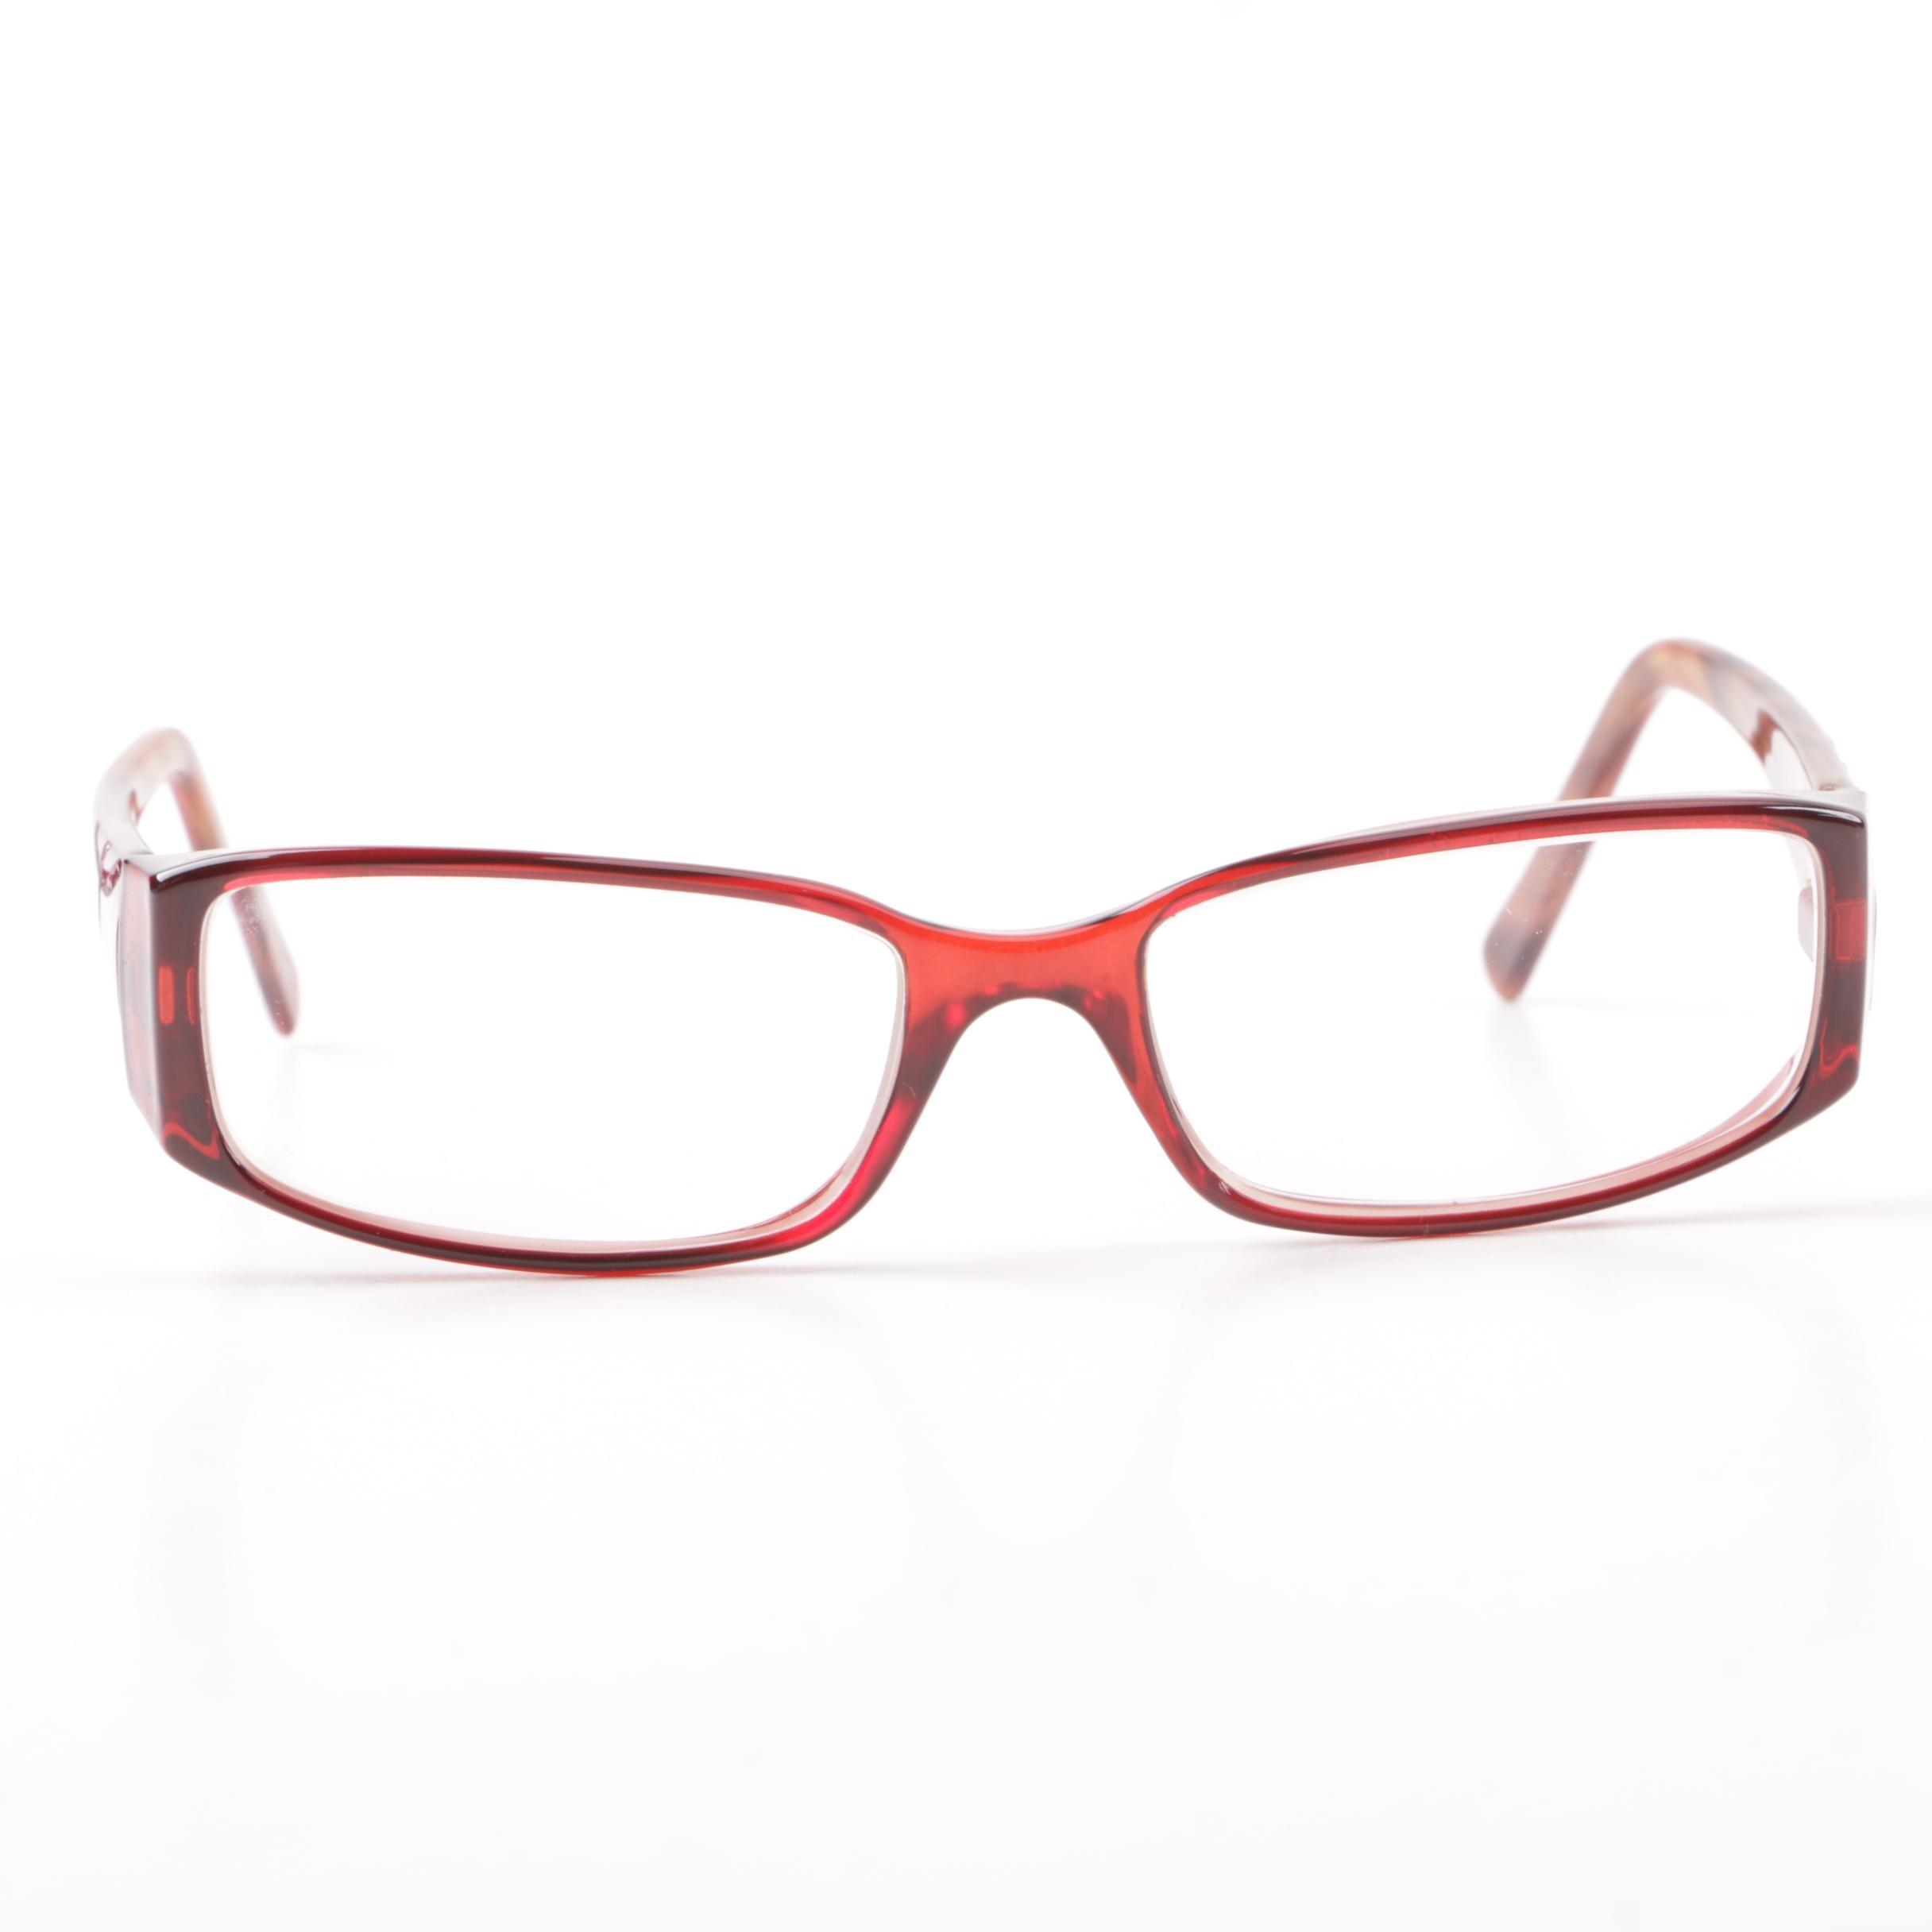 Calvin Klein Collection CK986 Cold Insert Prescription Eyeglasses with Case